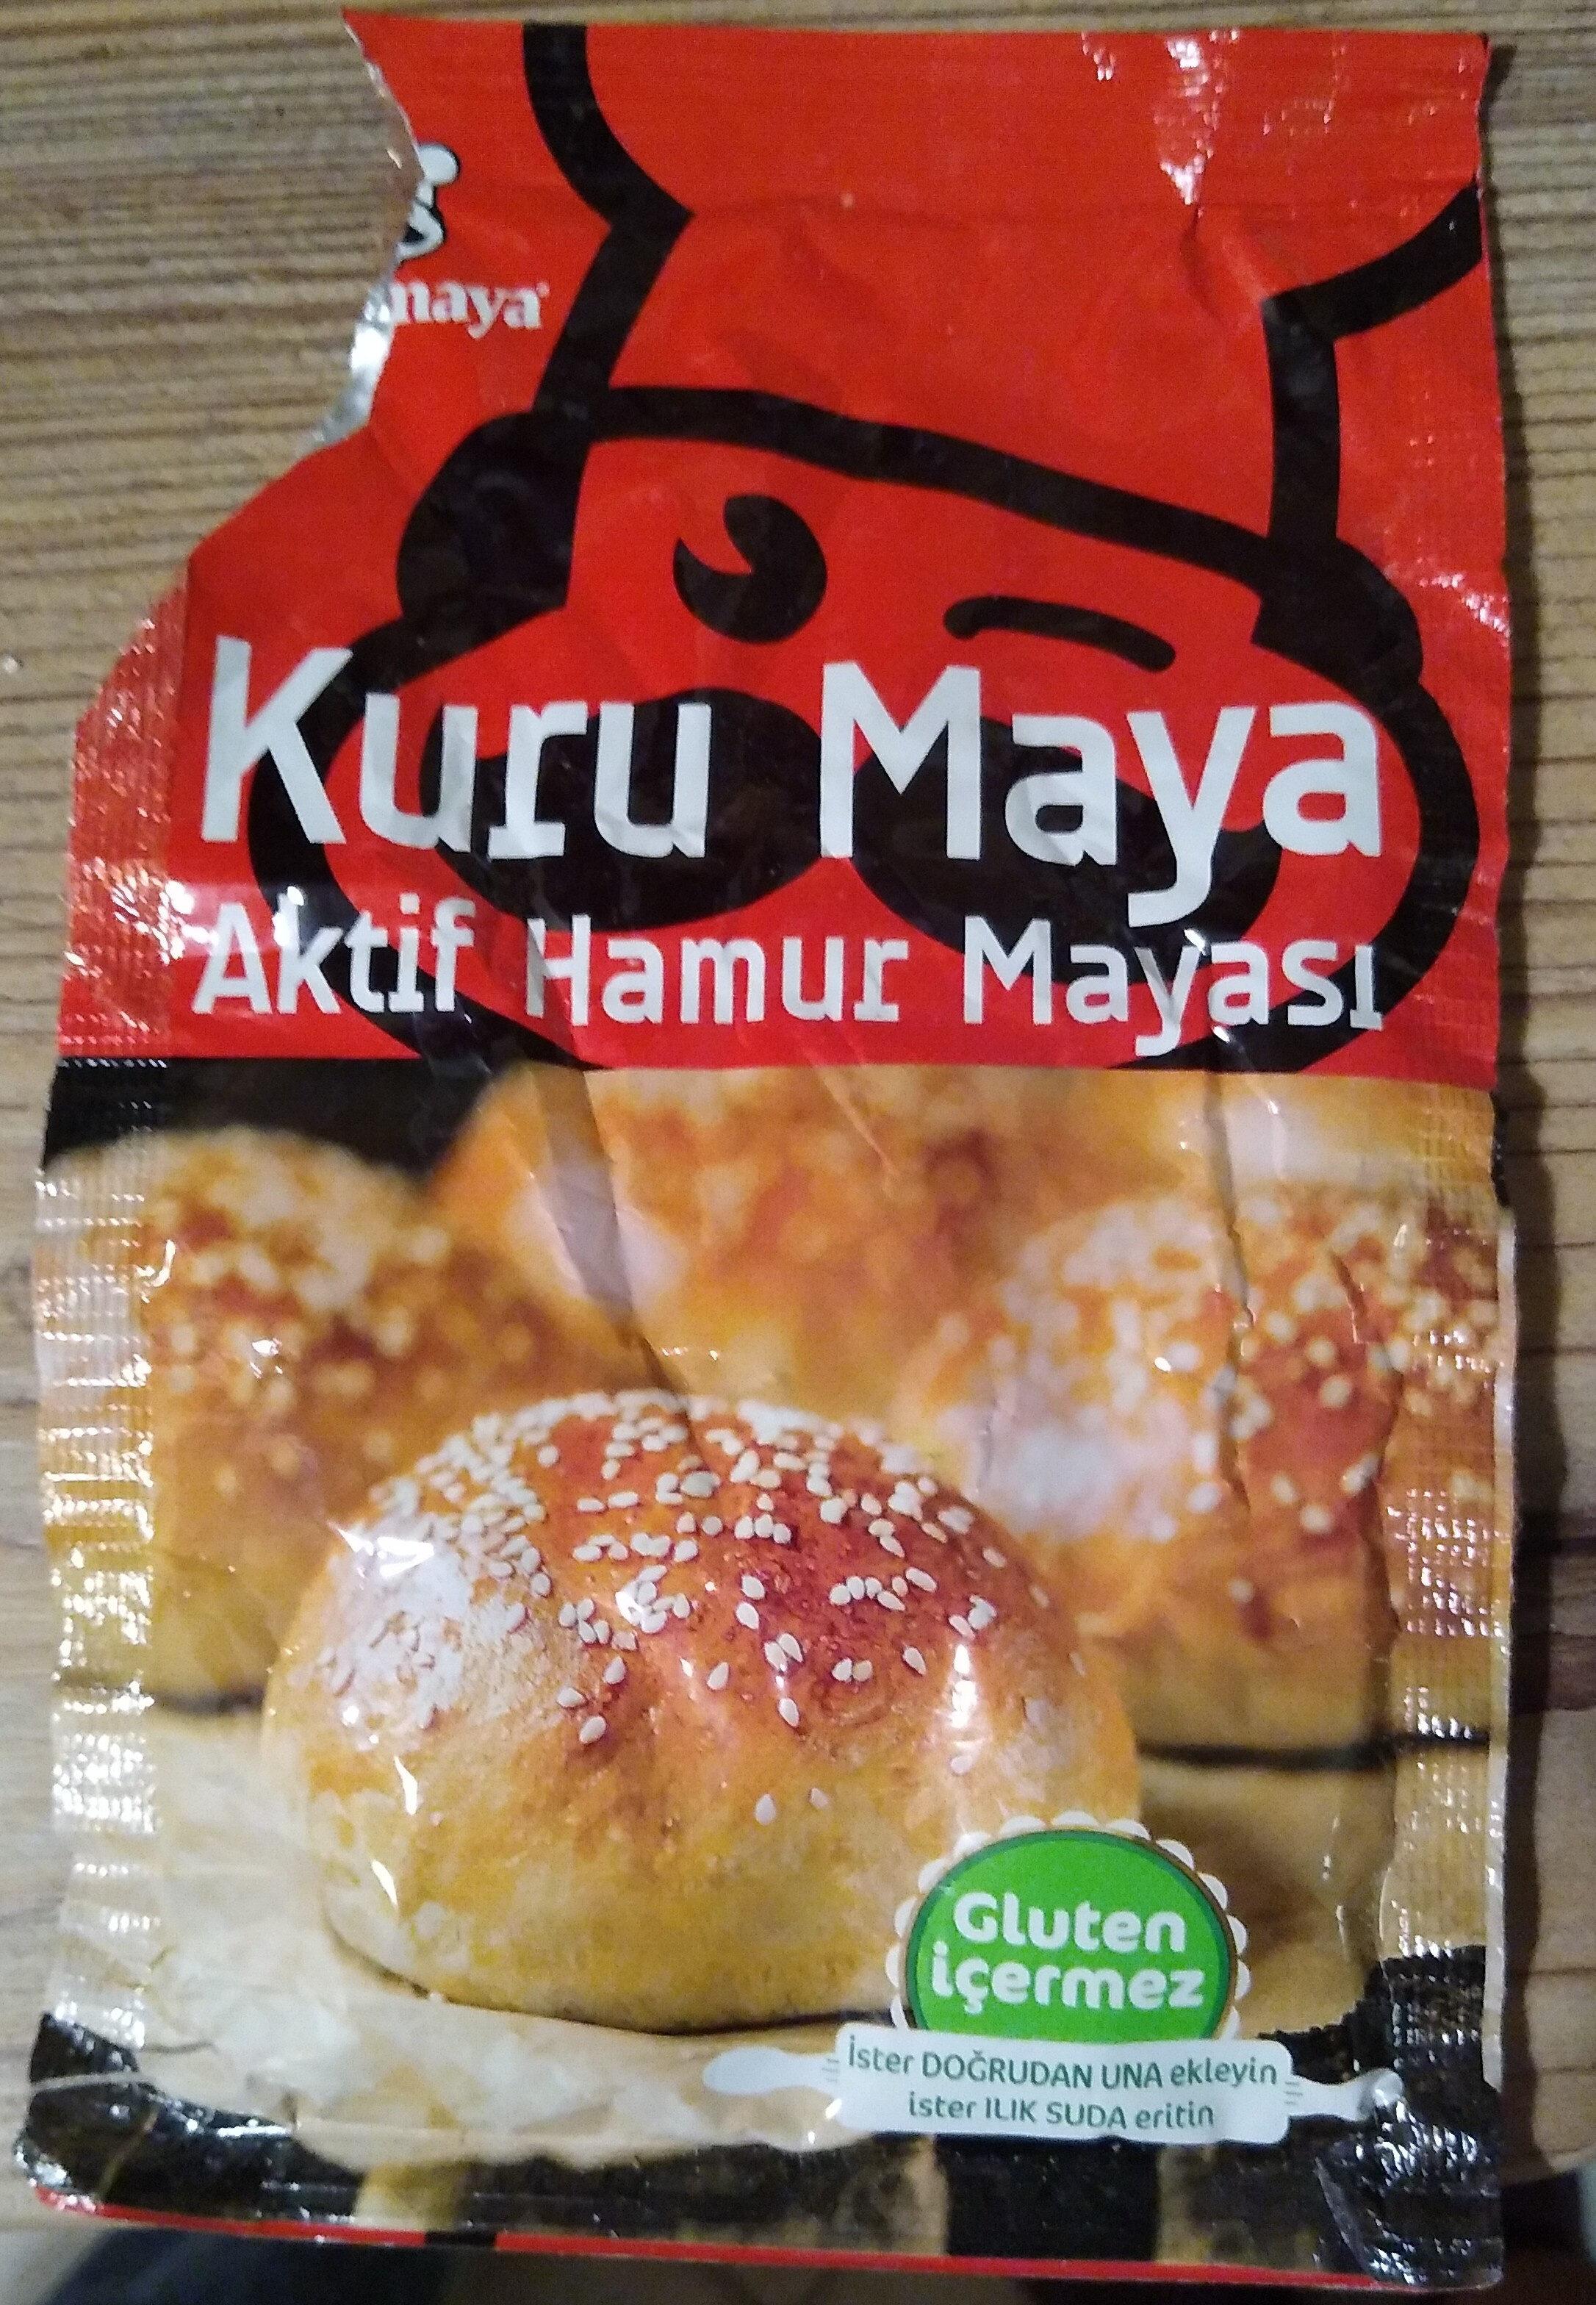 Kuru Maya Akif Hamr Mayasi - Ürün - tr